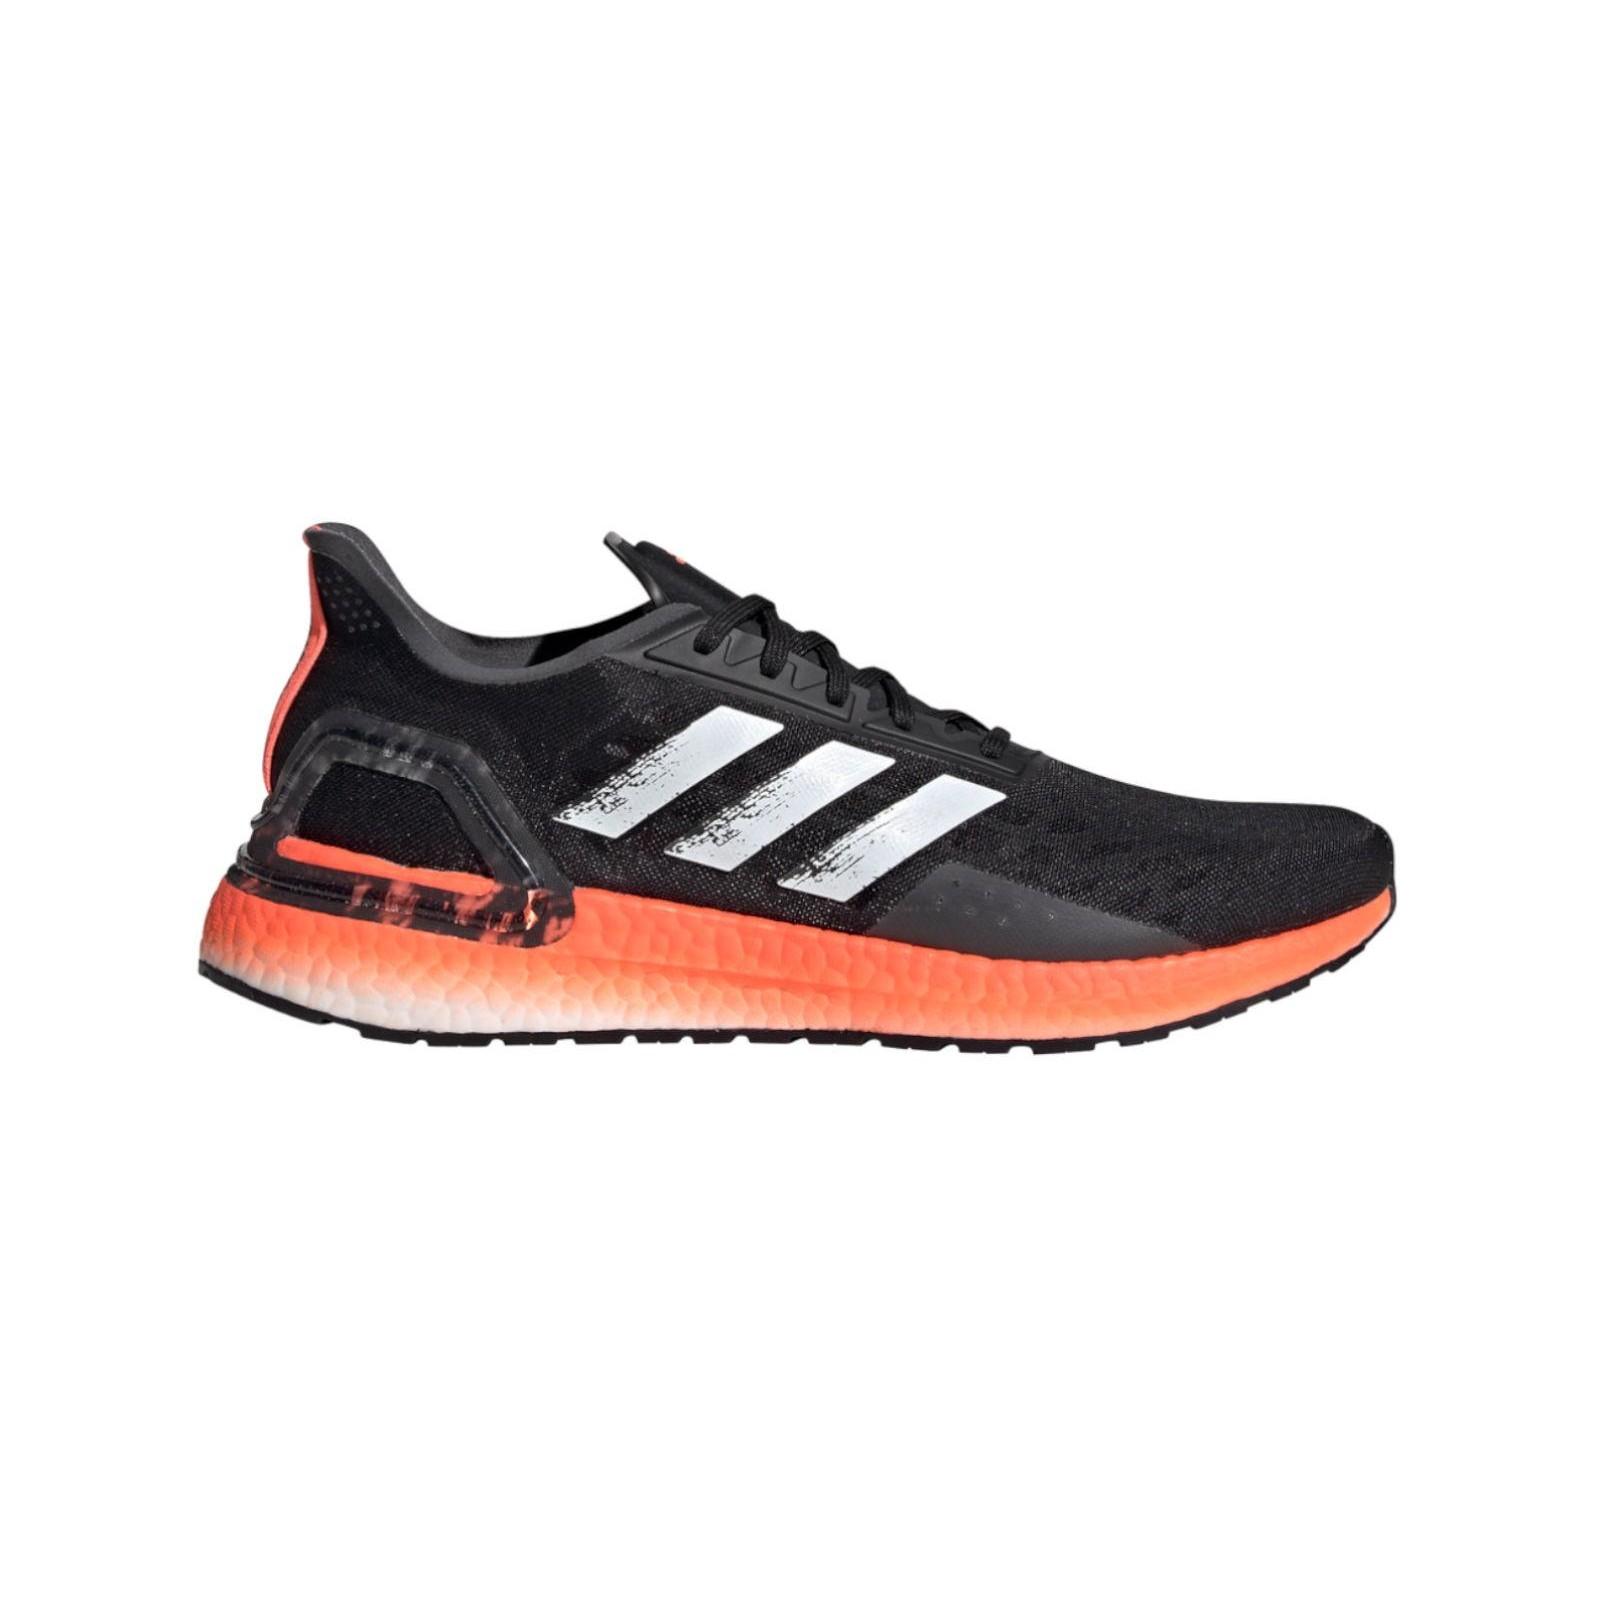 Adidas-ULTRABOOST 20 PB MUJER ADIEG0419